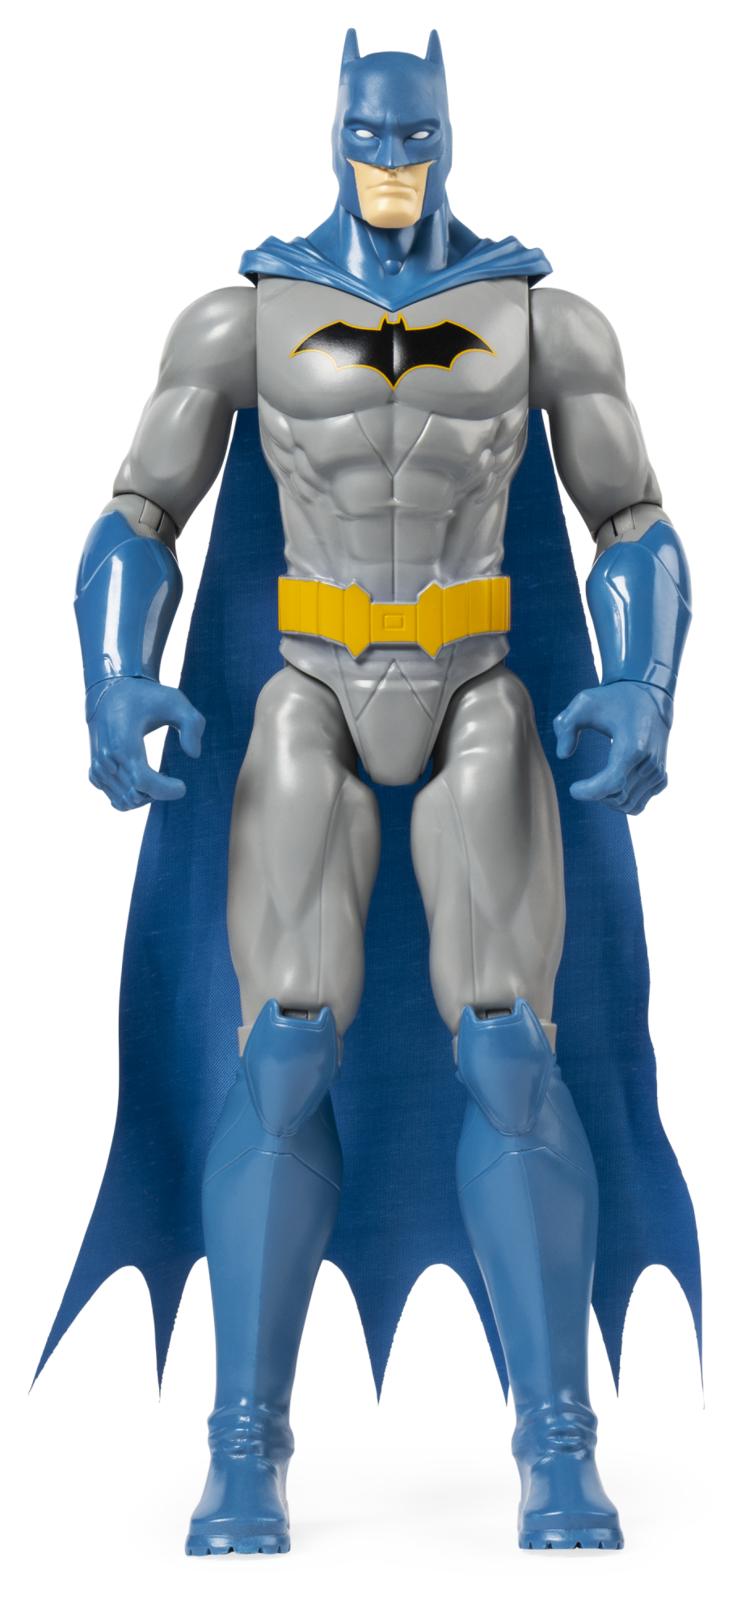 30 cm Figur- Batman